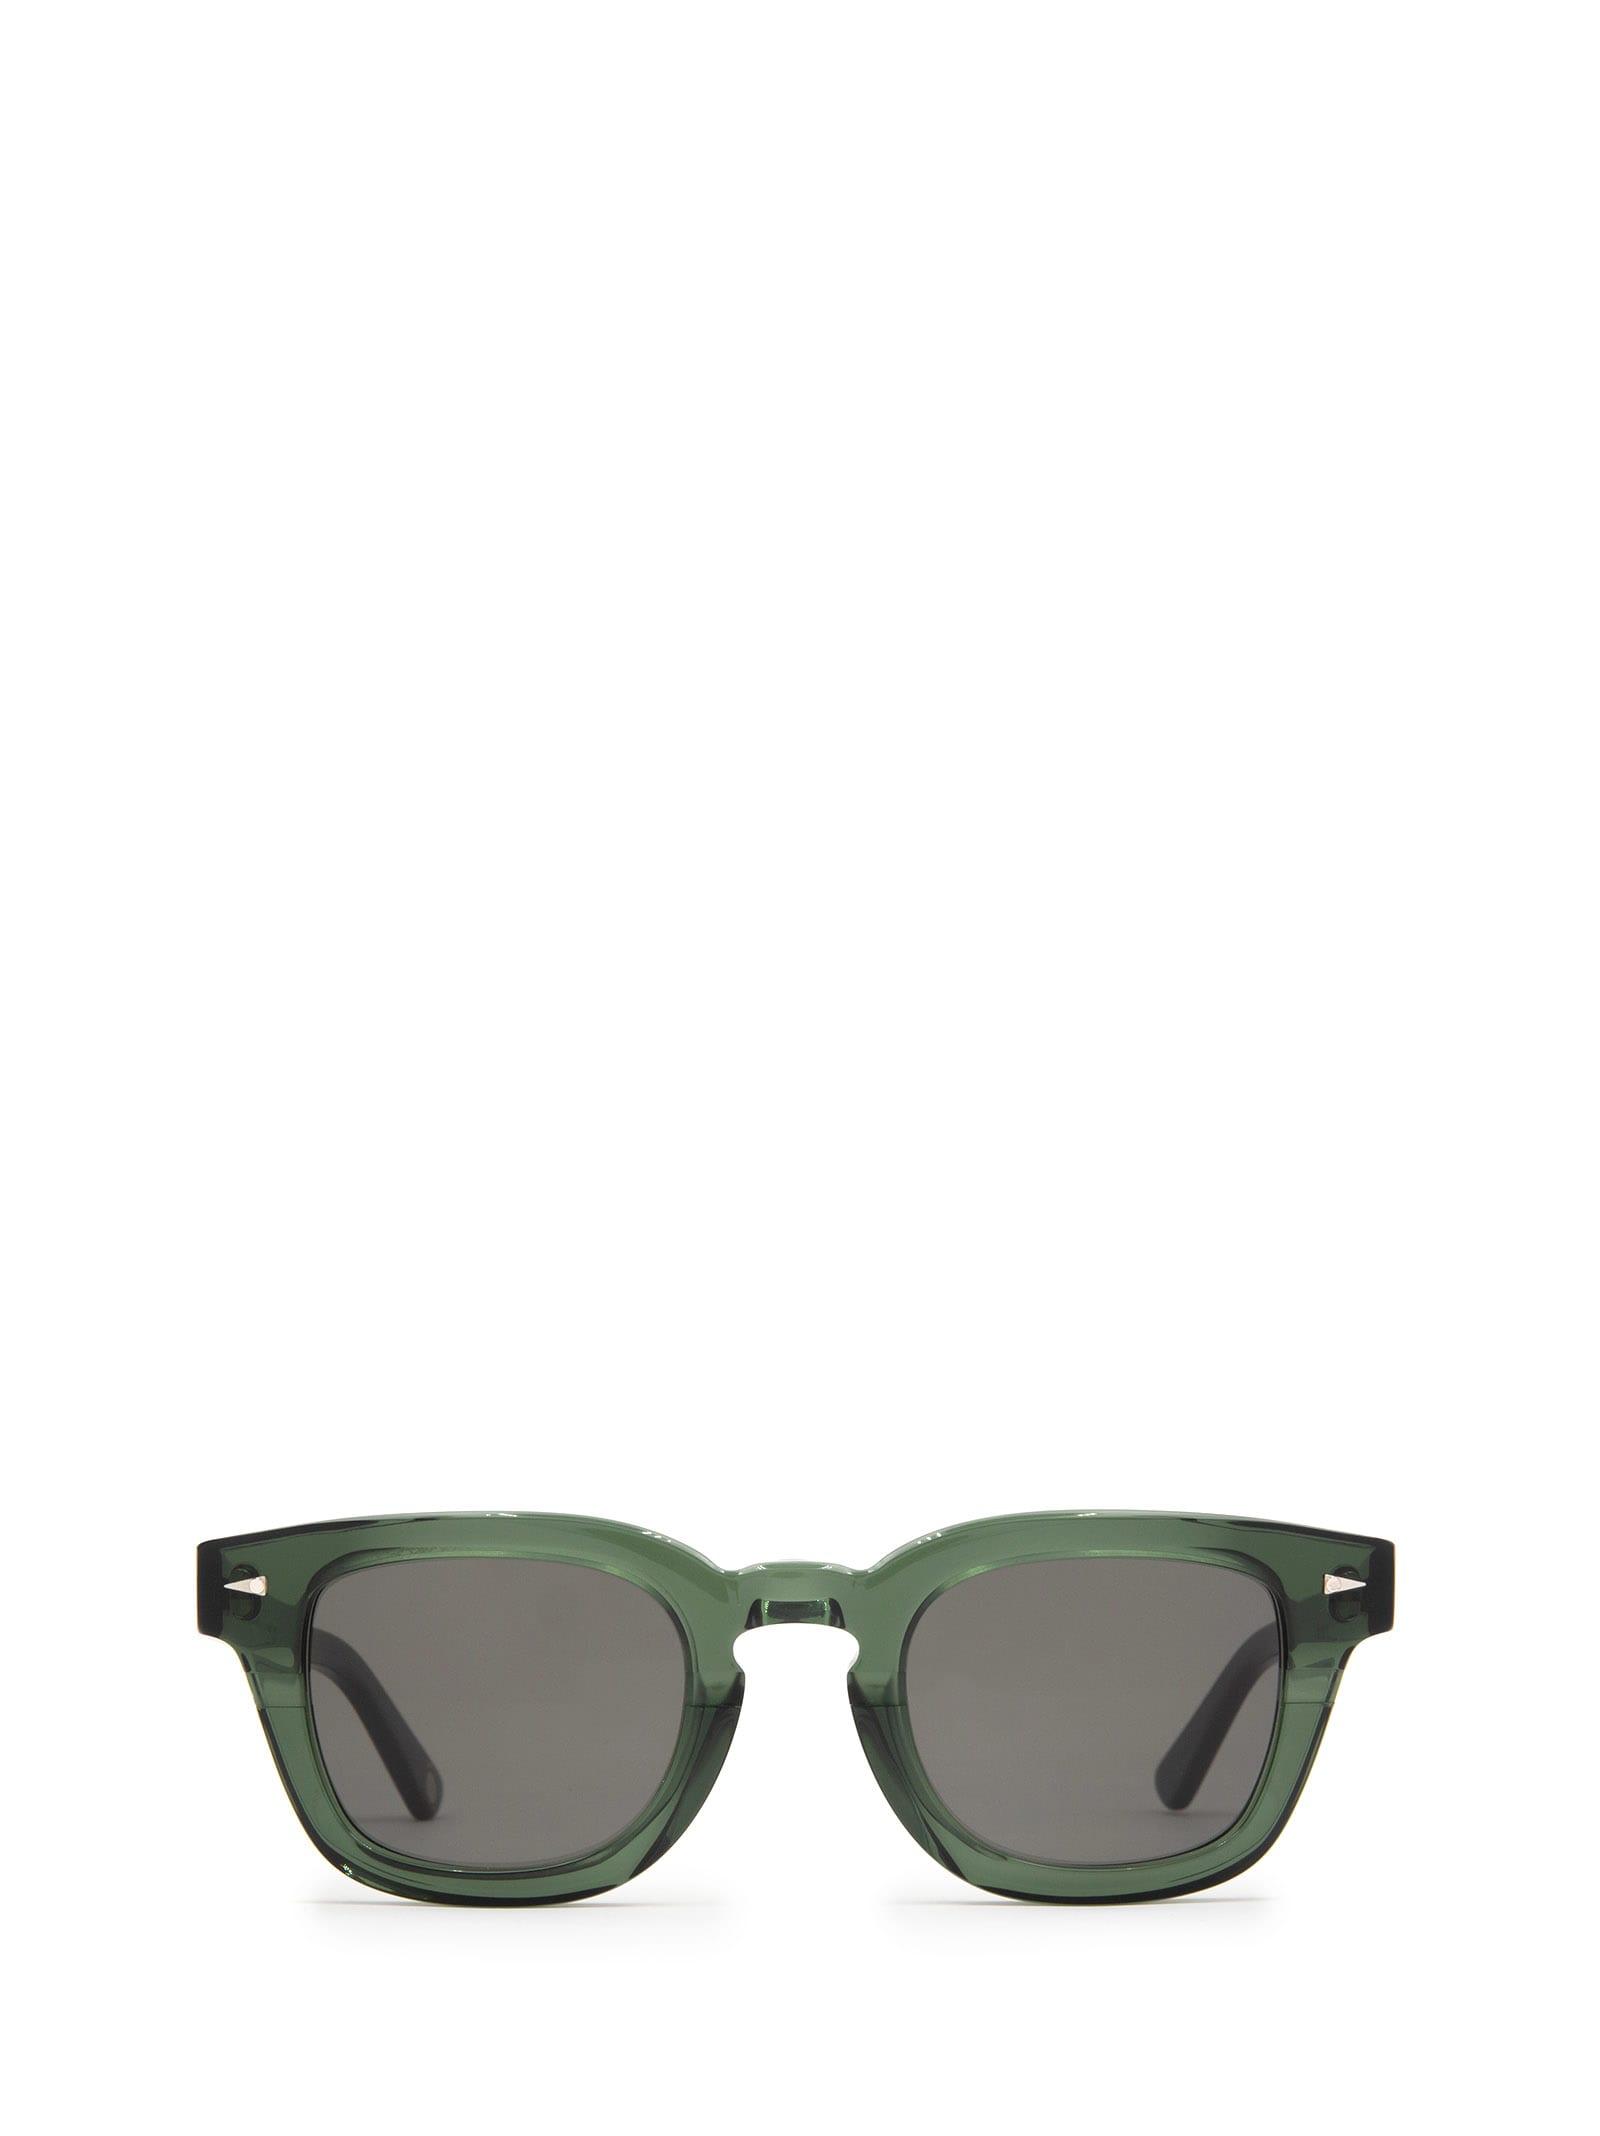 AHLEM Ahlem Champ De Mars Dark Green Sunglasses